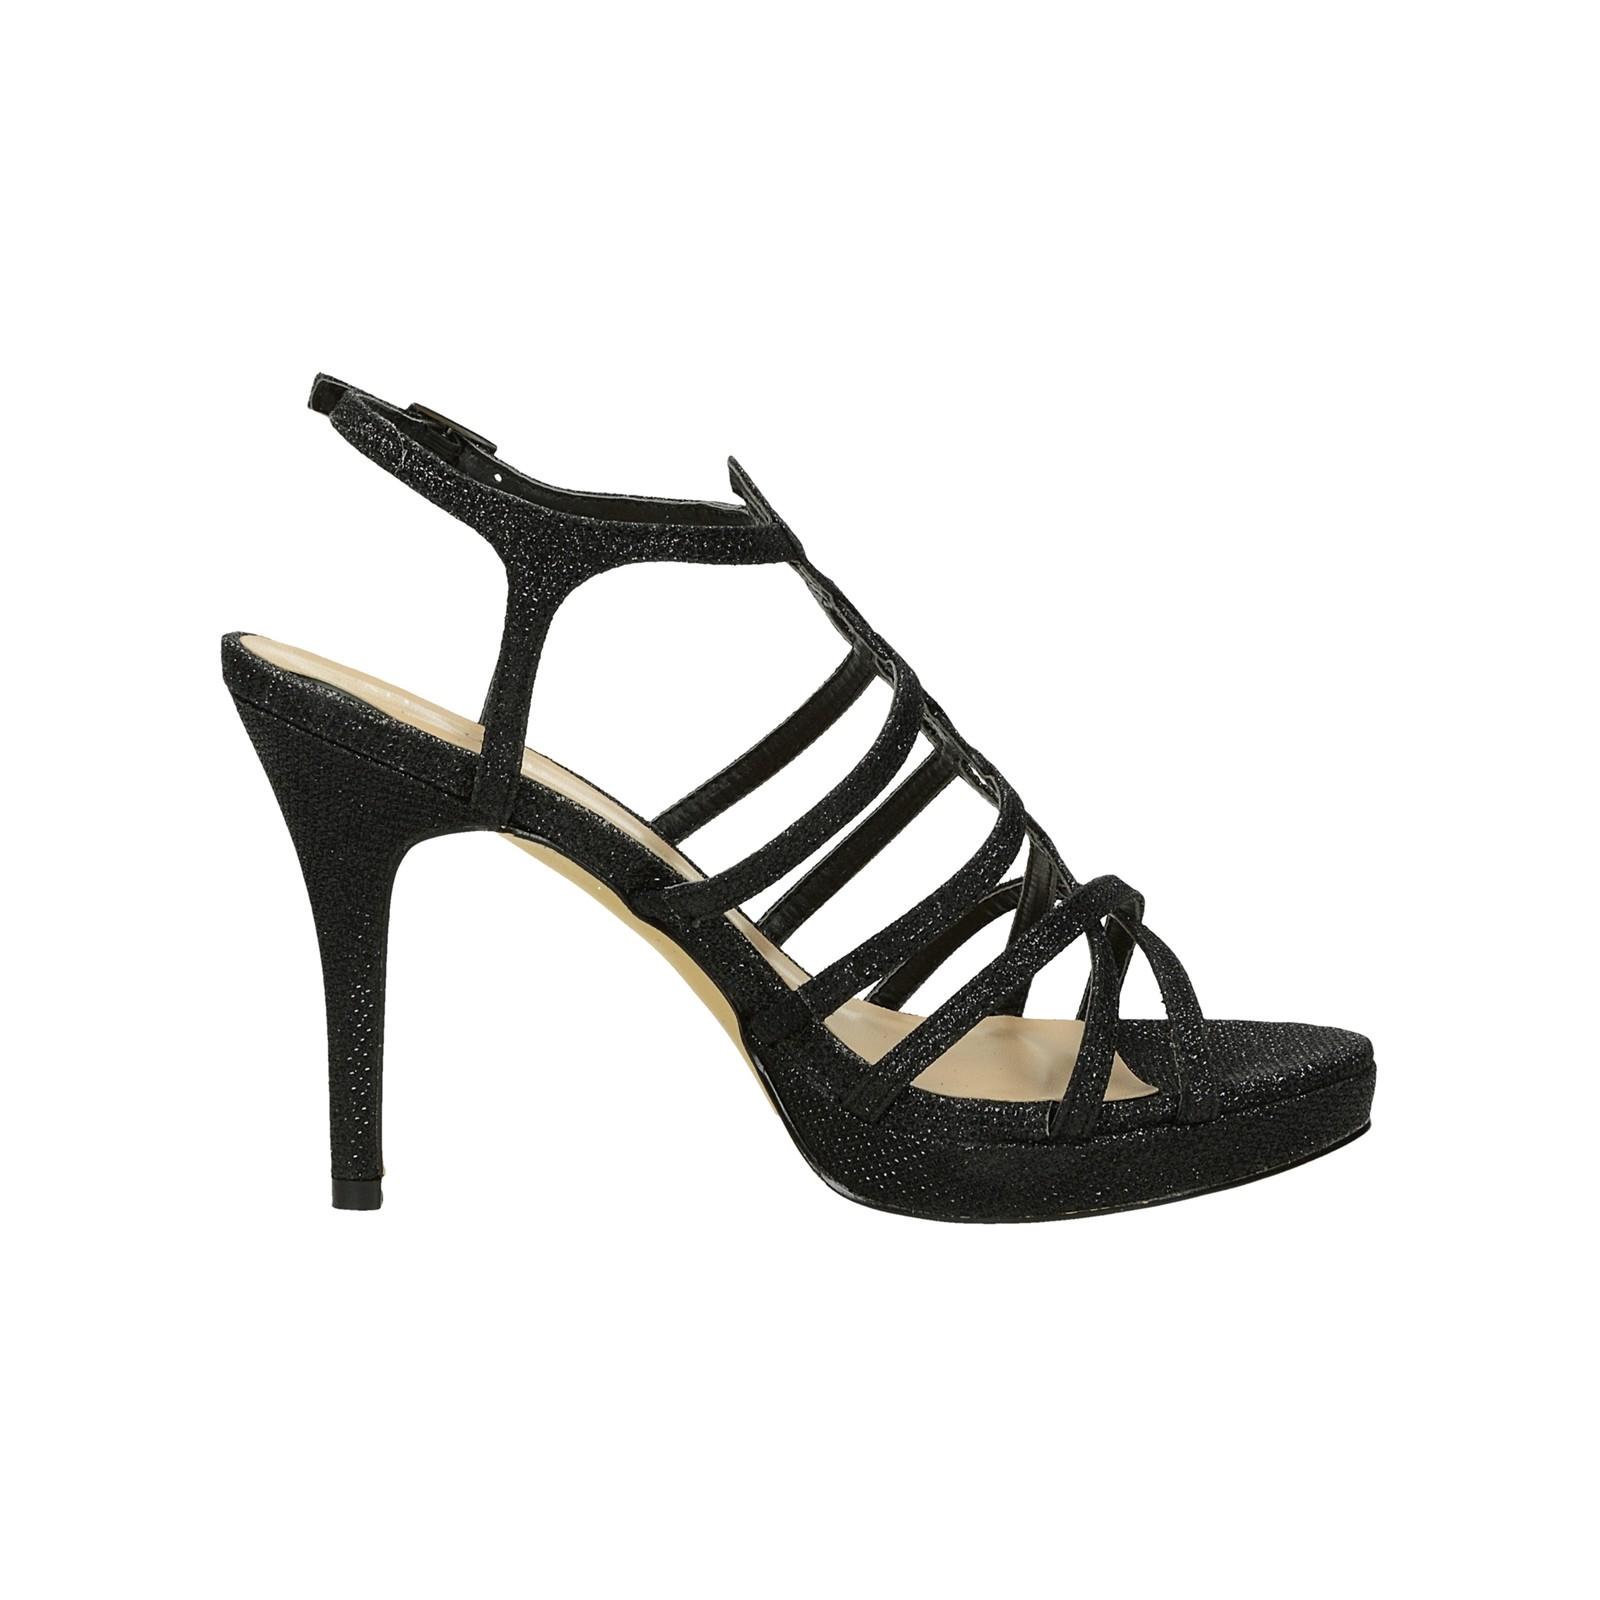 Menbur dámske spoločenské sandále - čierne